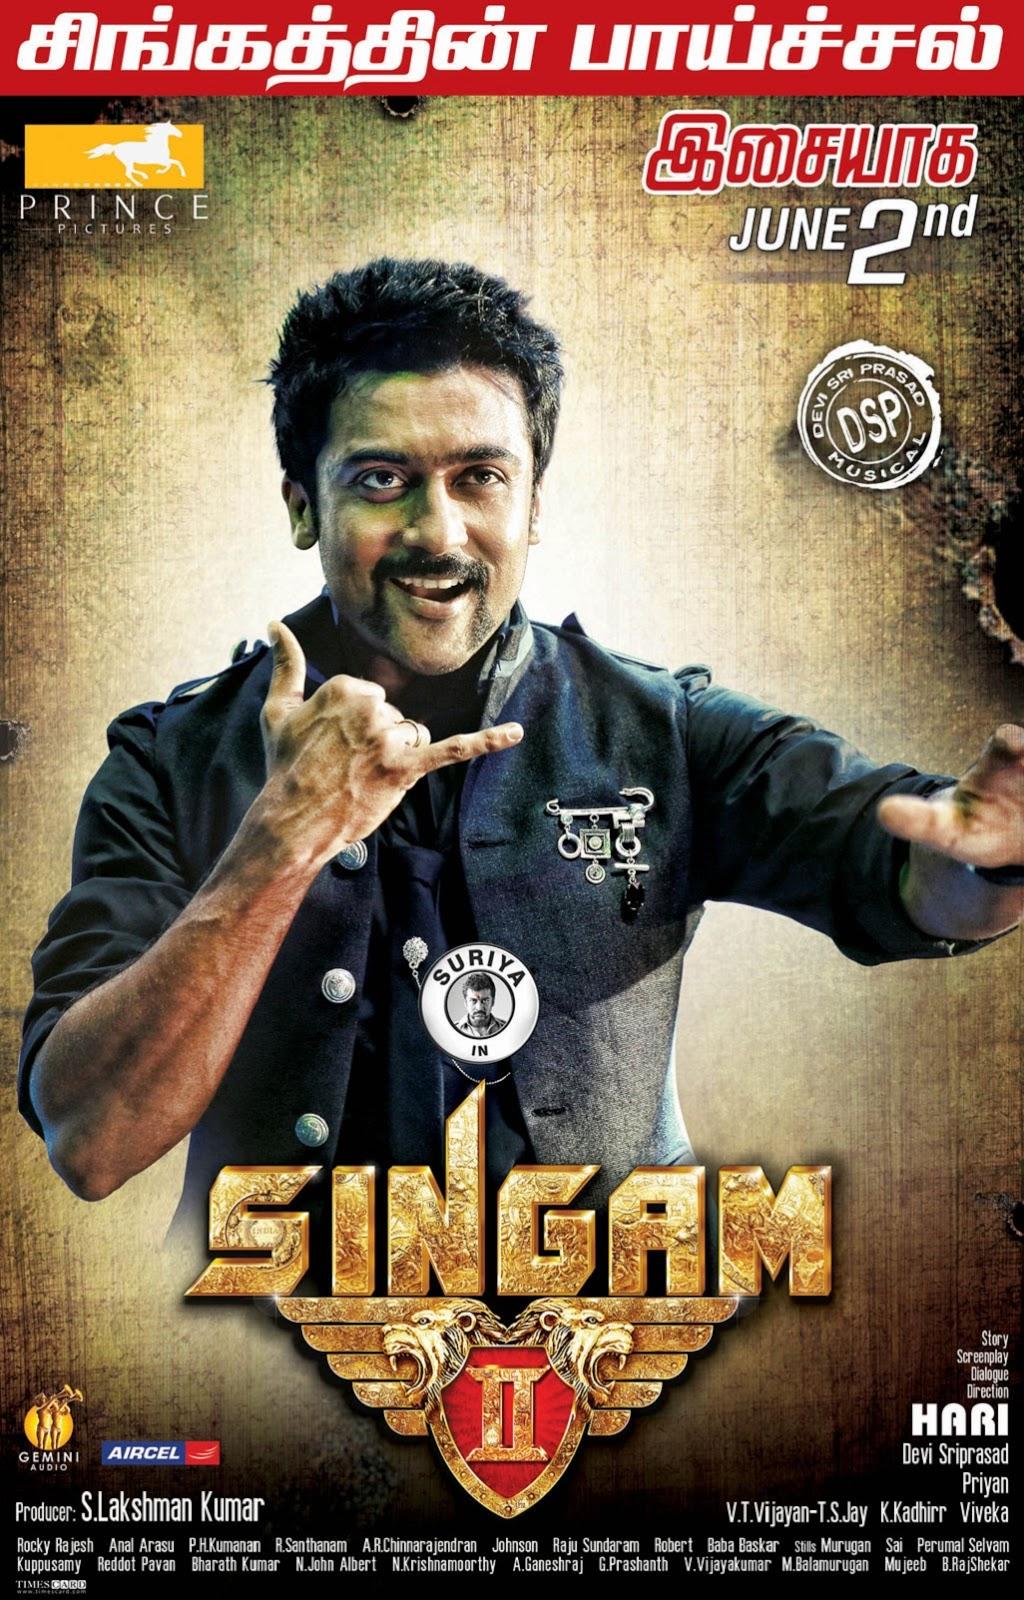 Tamil Actor Surya Singam 2 firstlook Posters In HD - Actor ...